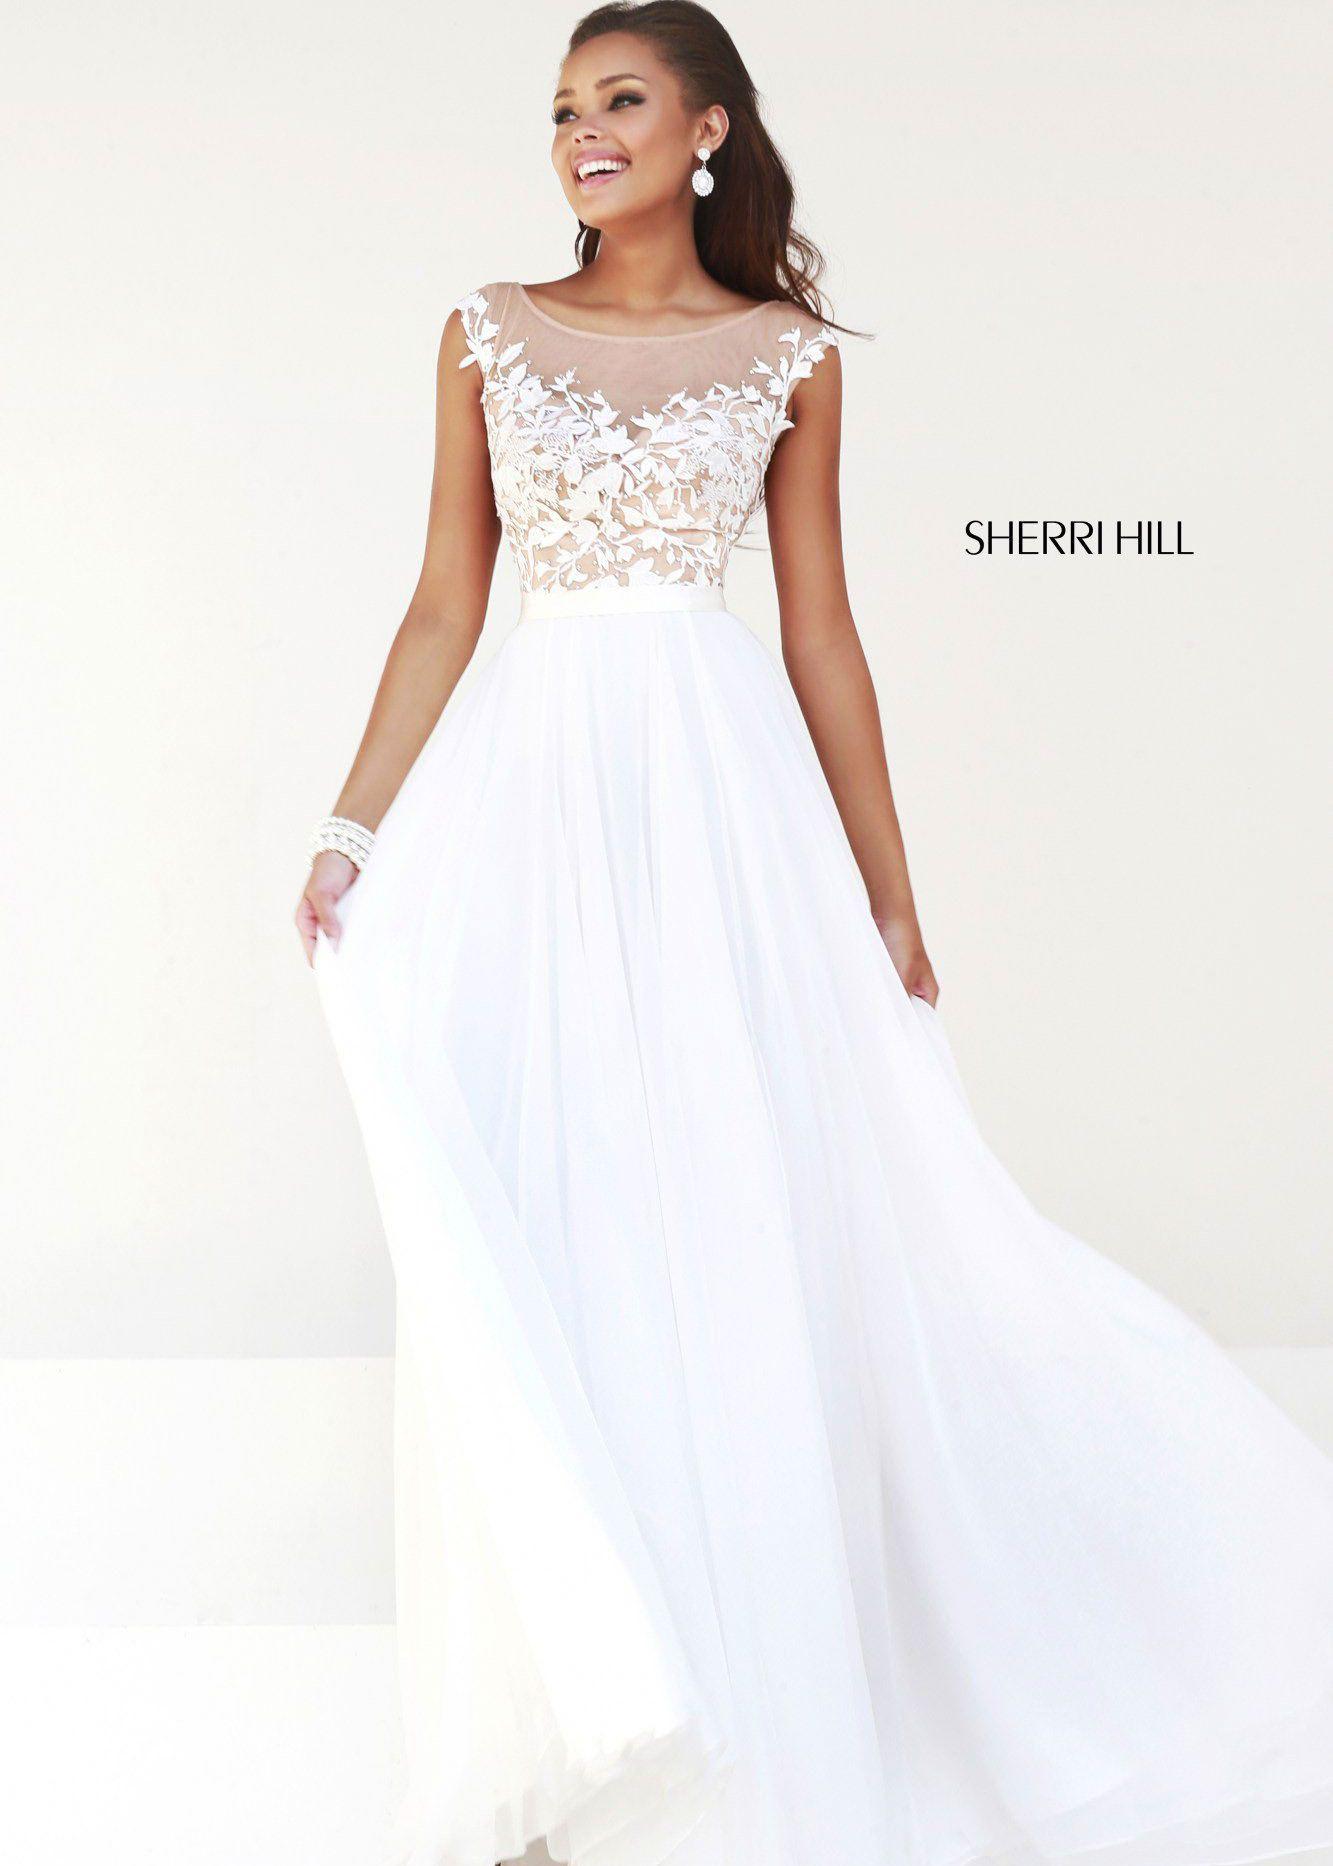 35+ Sherri hill wedding dresses ideas ideas in 2021